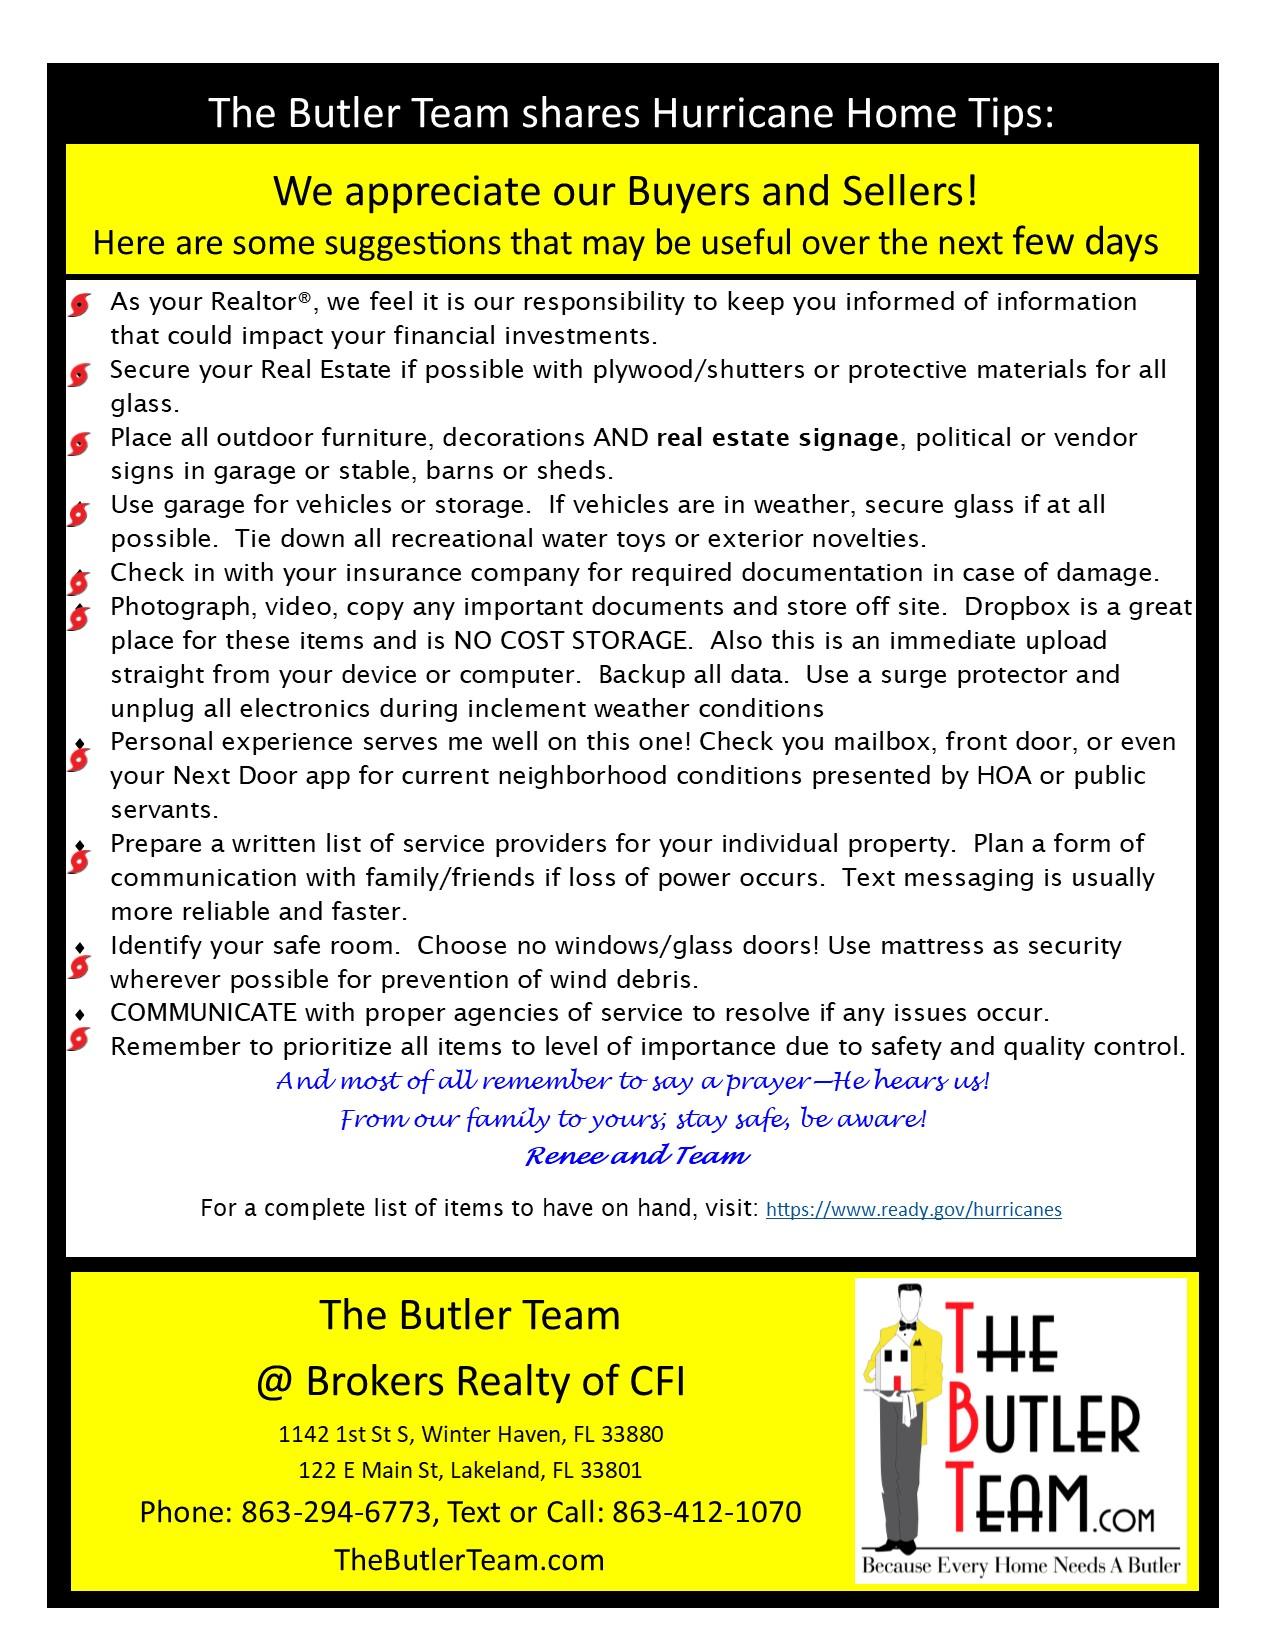 the Butler team shares Hurricane Home Tips